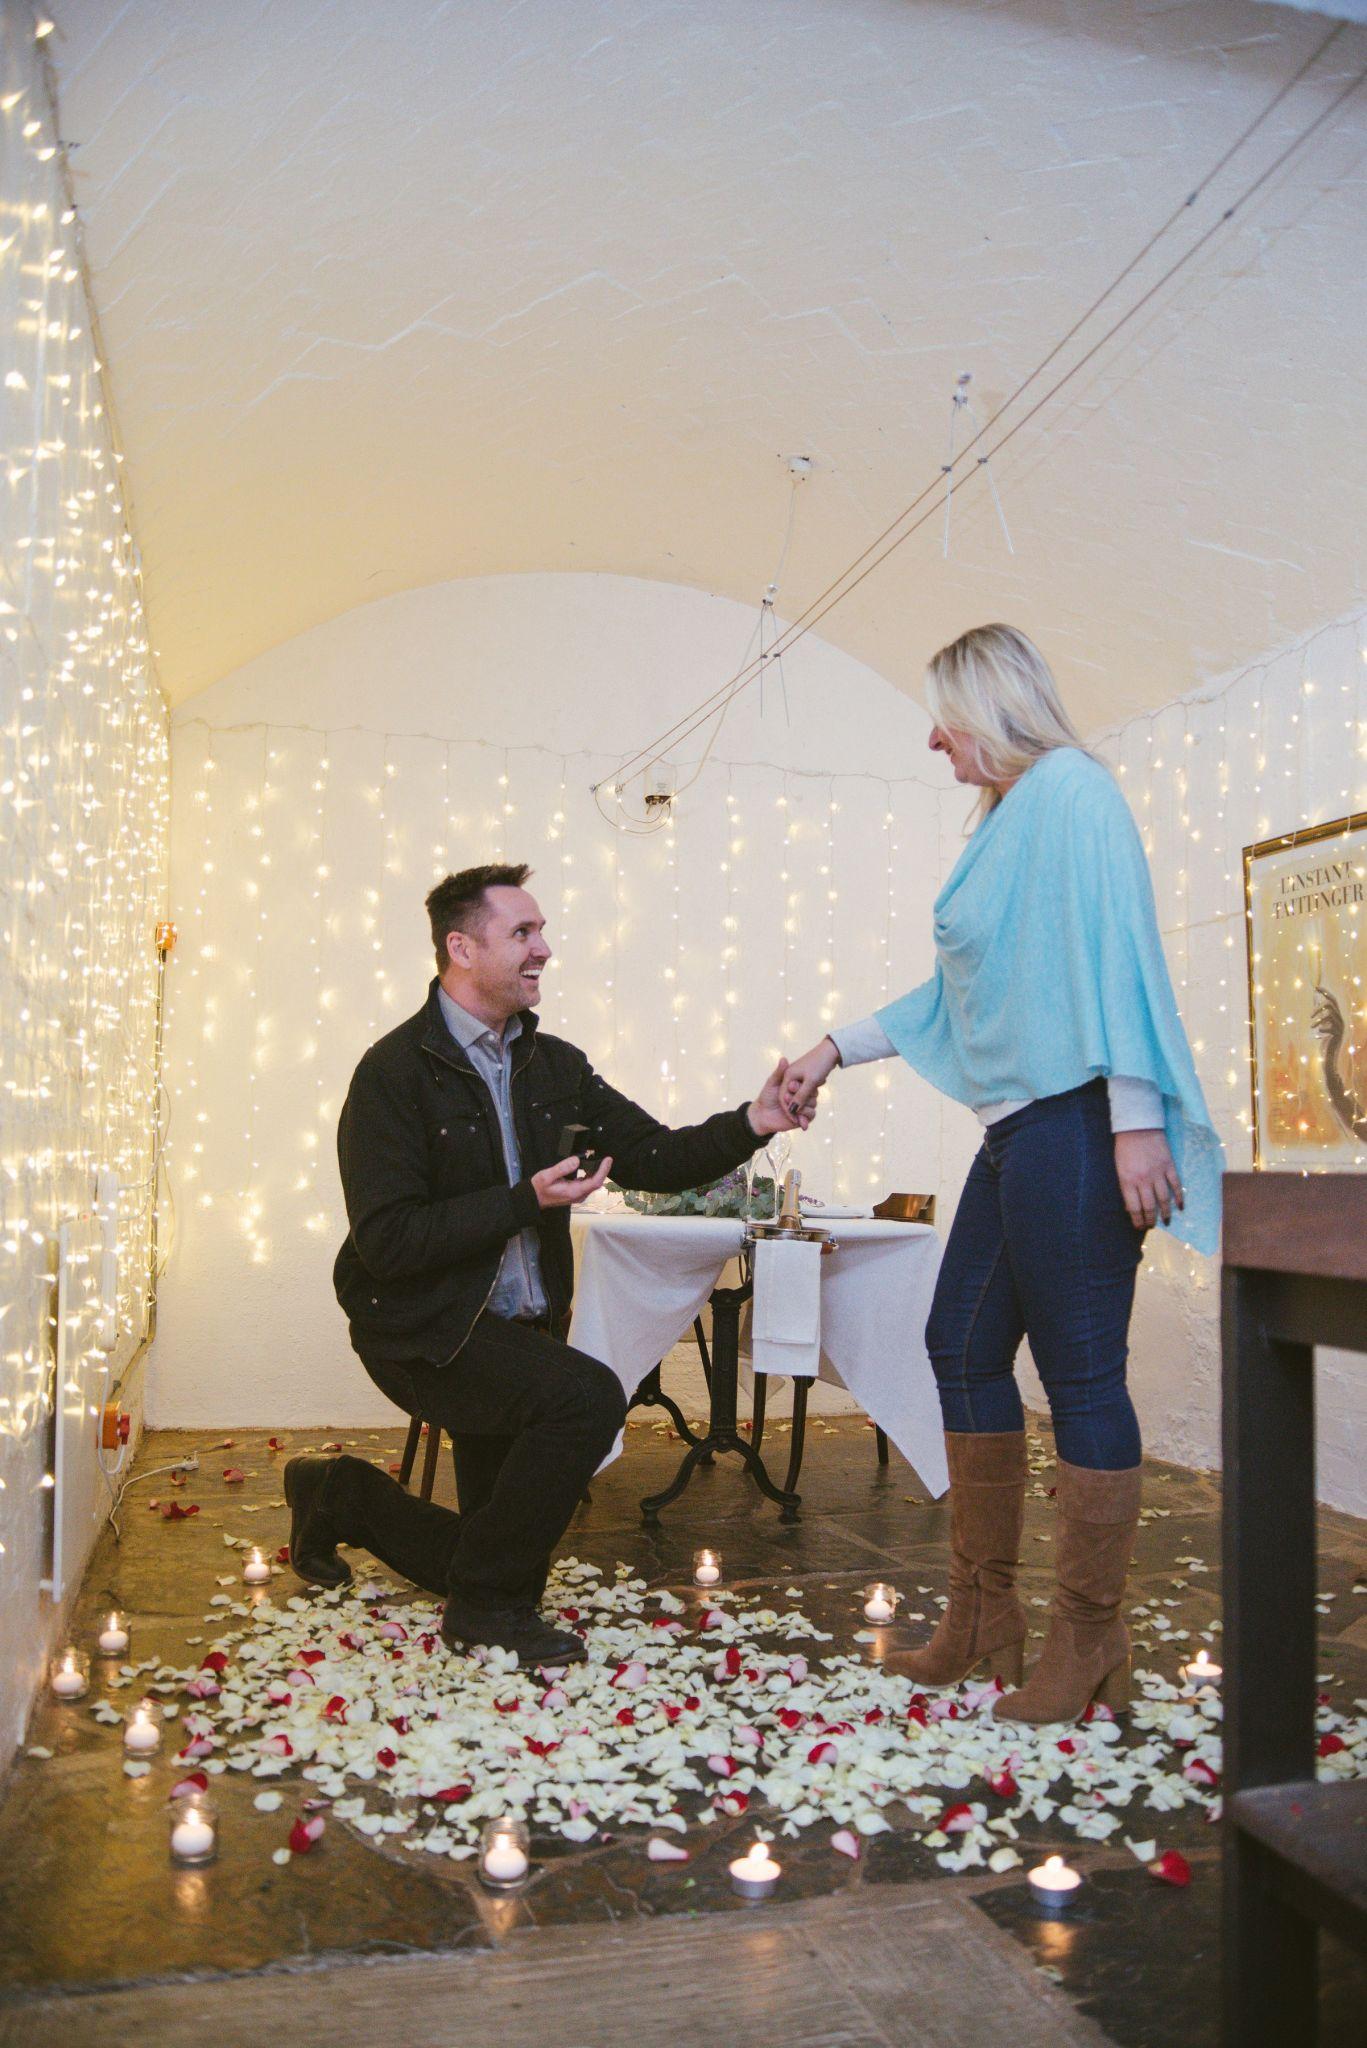 Deon and Nolene wine cellar proposal